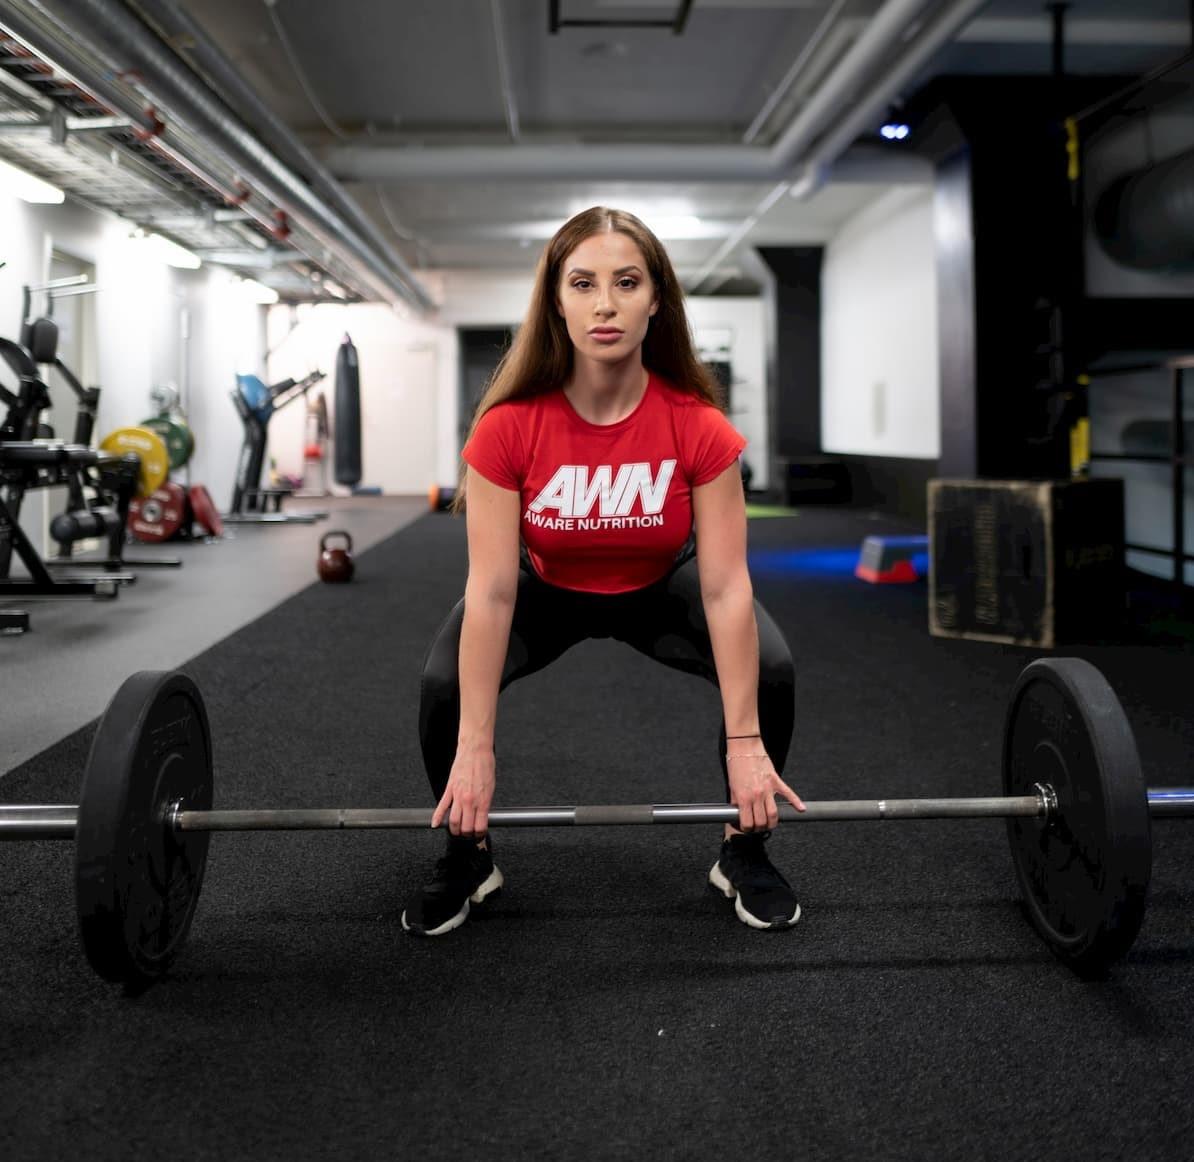 Exercice Musculation Pour Femme : Les Meilleurs Exercices ...